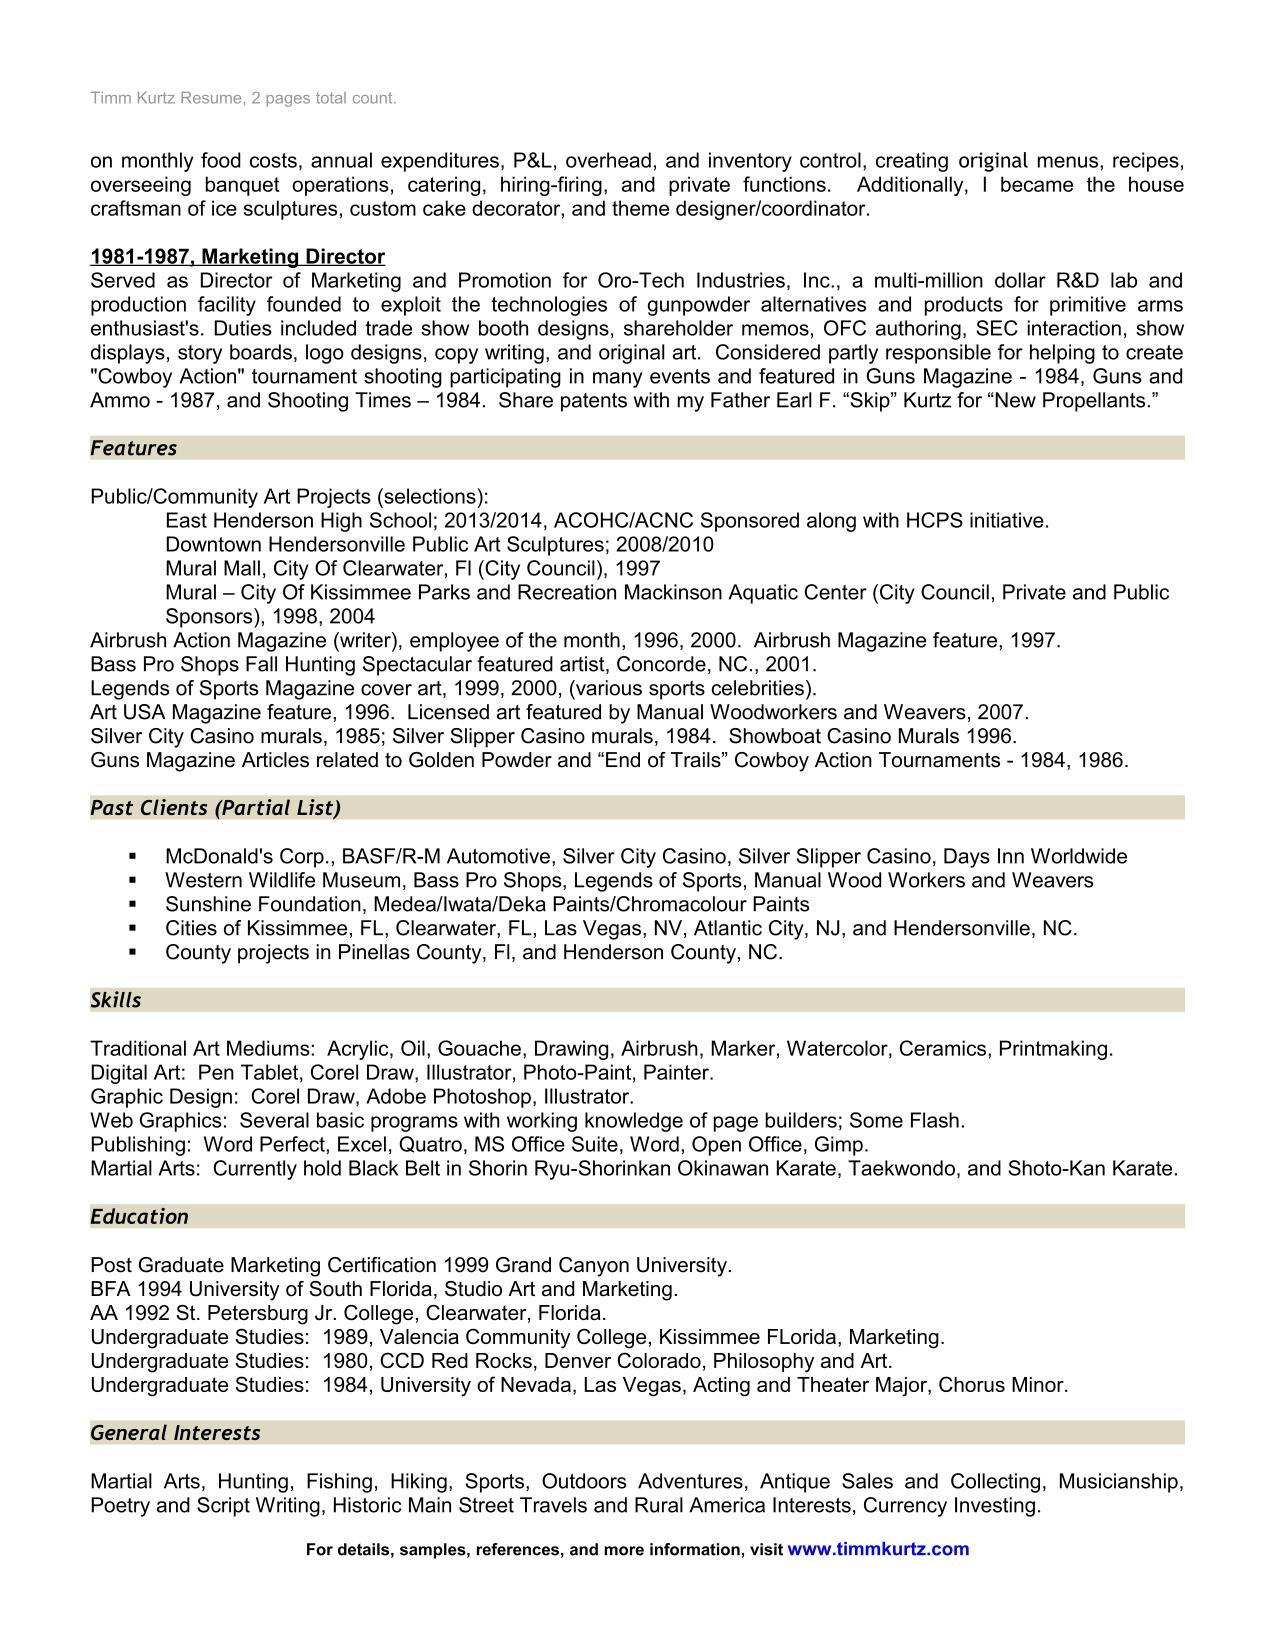 resume page 2-2015.jpg